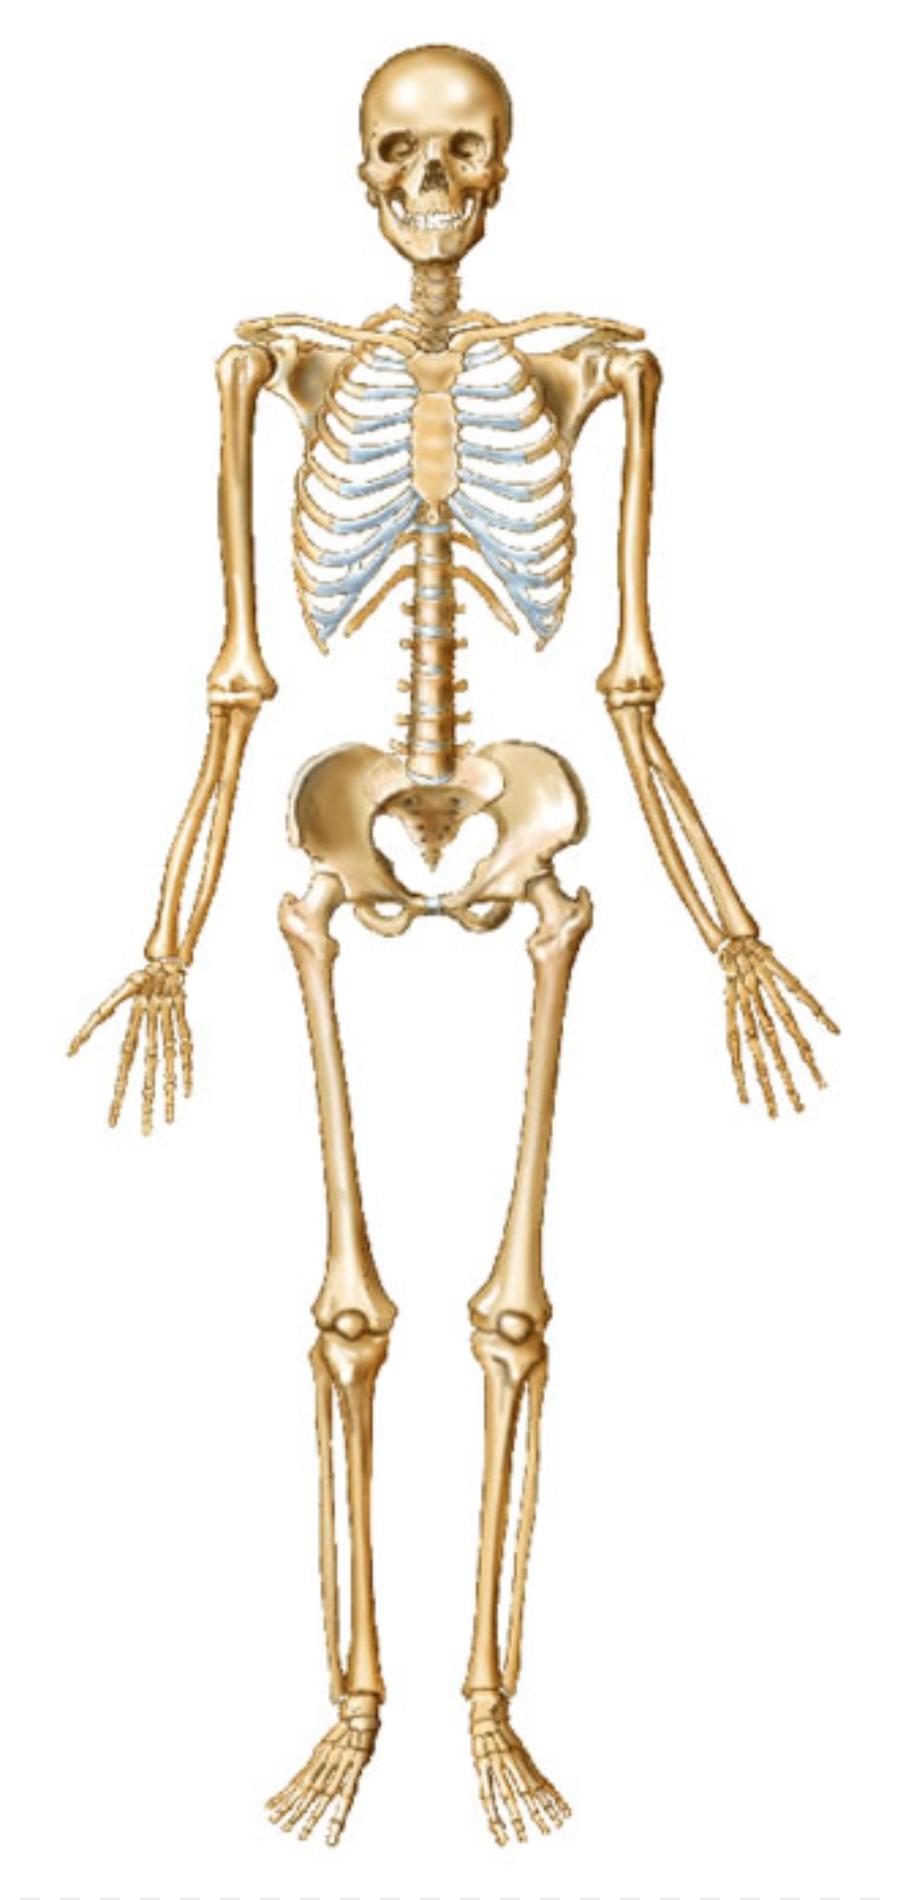 Esqueleto humano Huesos del cuerpo Humano Conjunta - Esqueleto ...